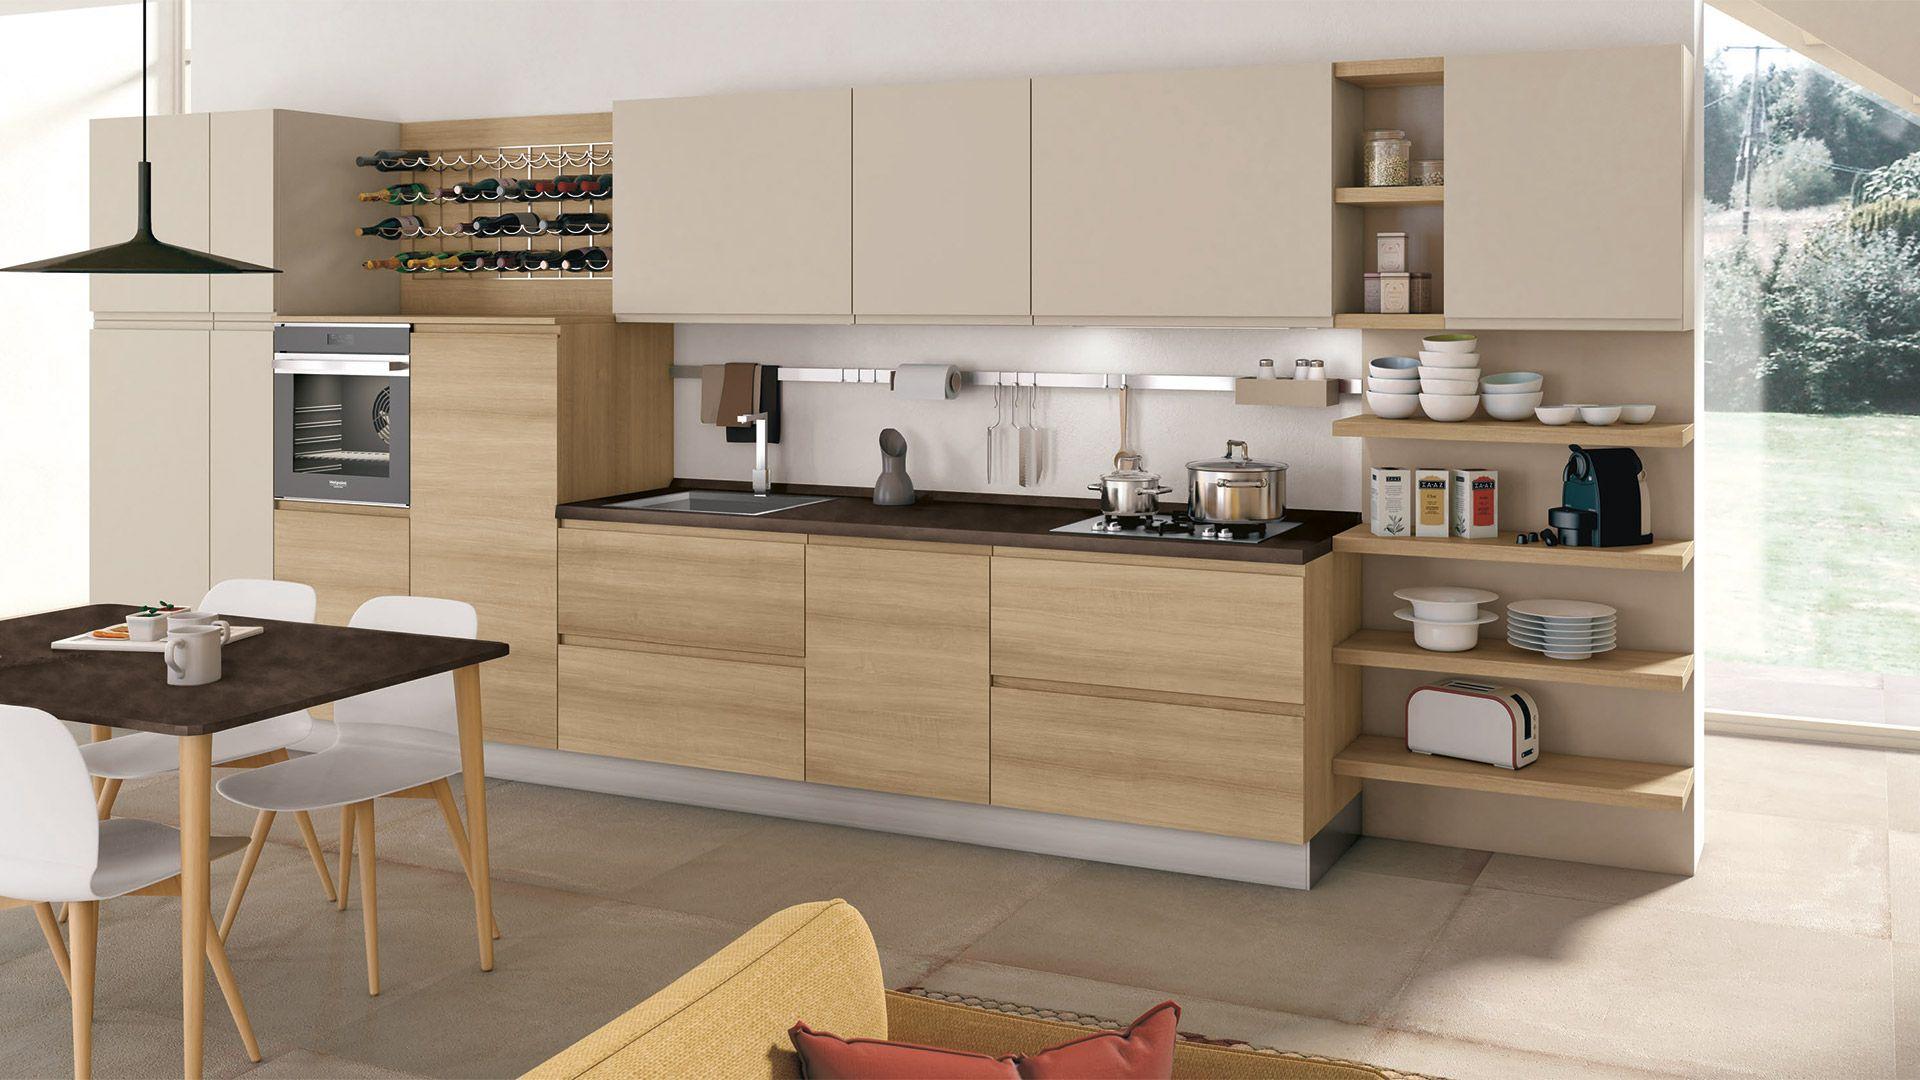 Cucina Jey - Cucine Moderne - Creo Kitchens nel 2019 ...